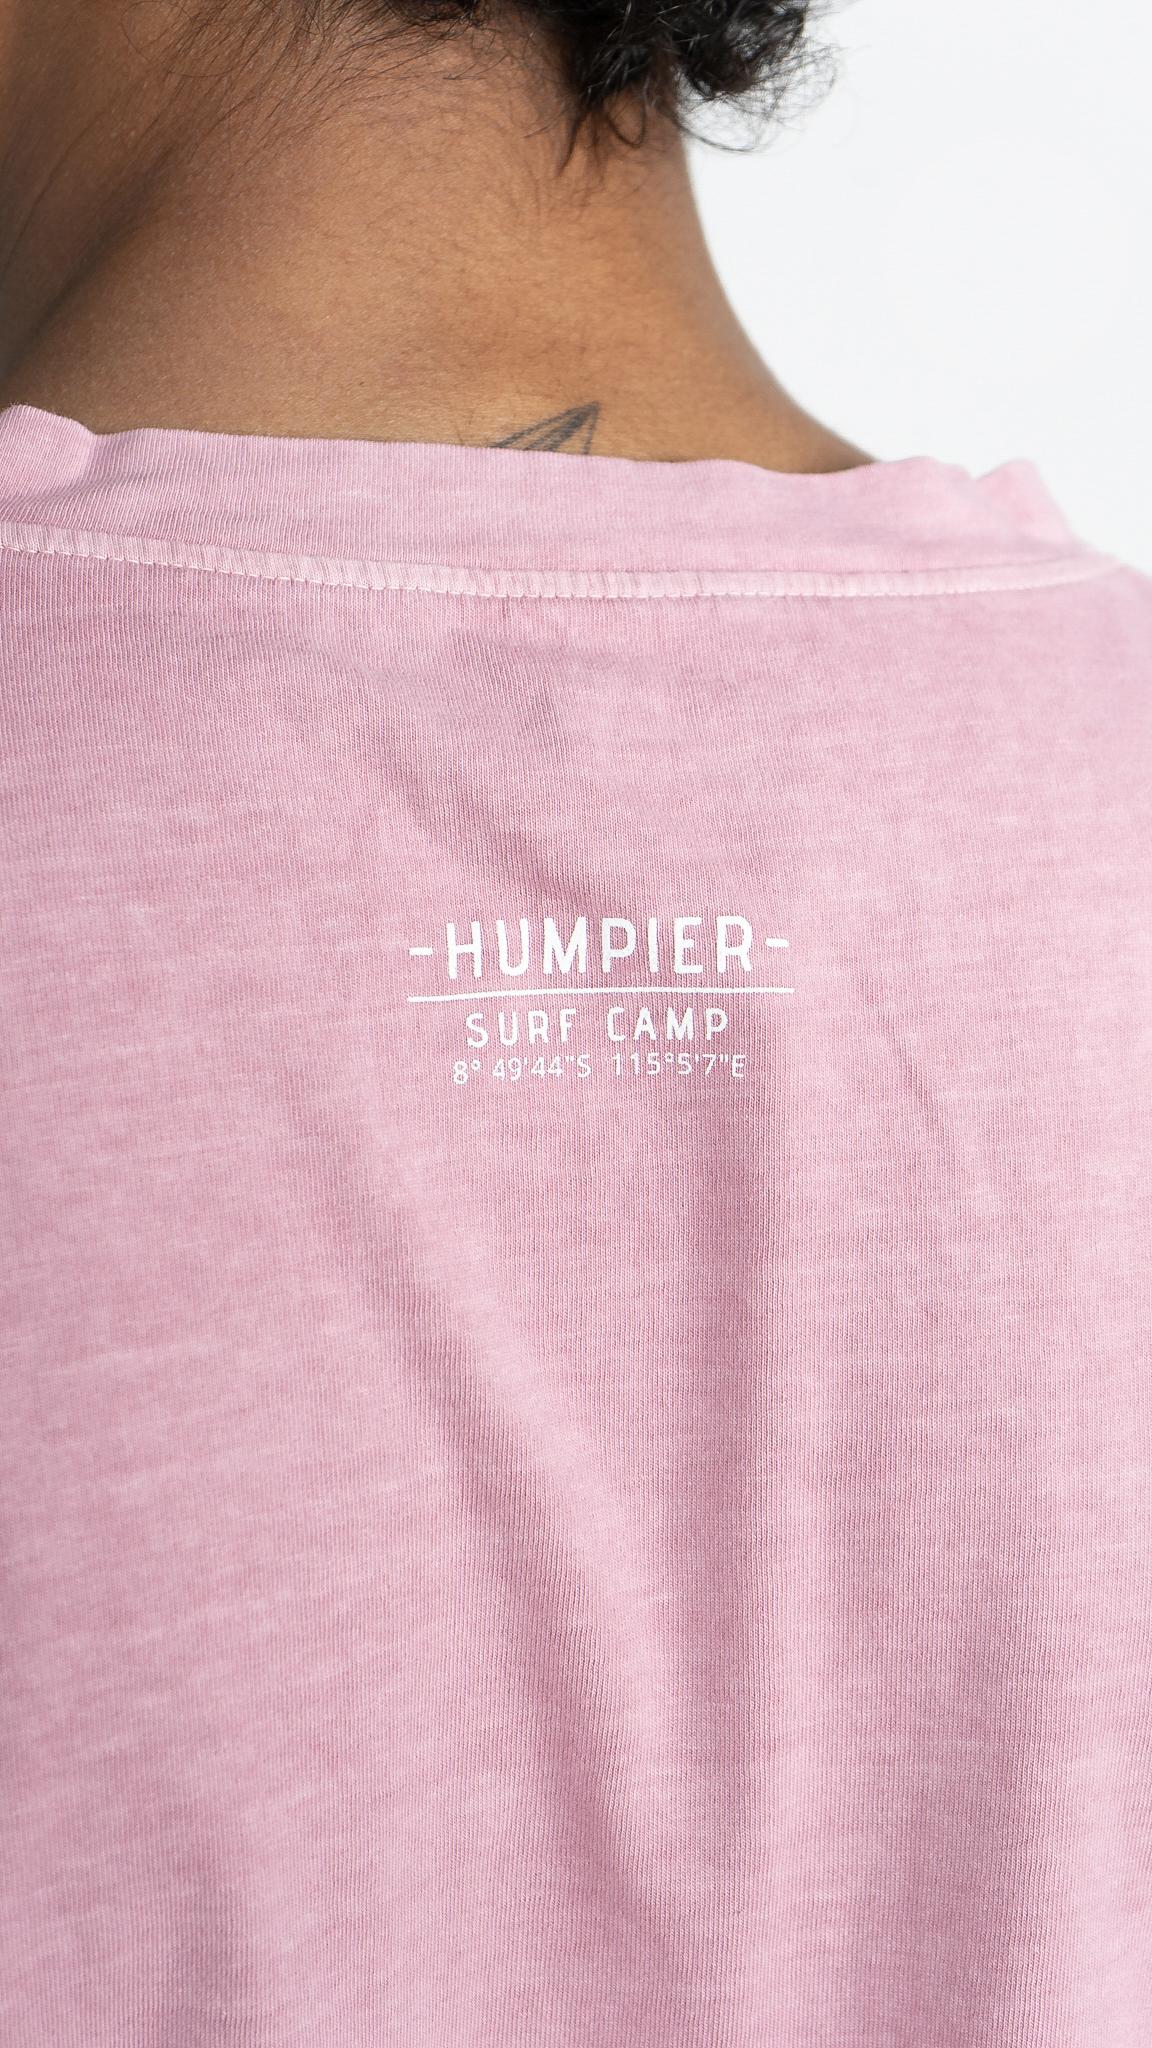 Sudadera Humpier Surf Camp | Humpier | Algodón orgánico